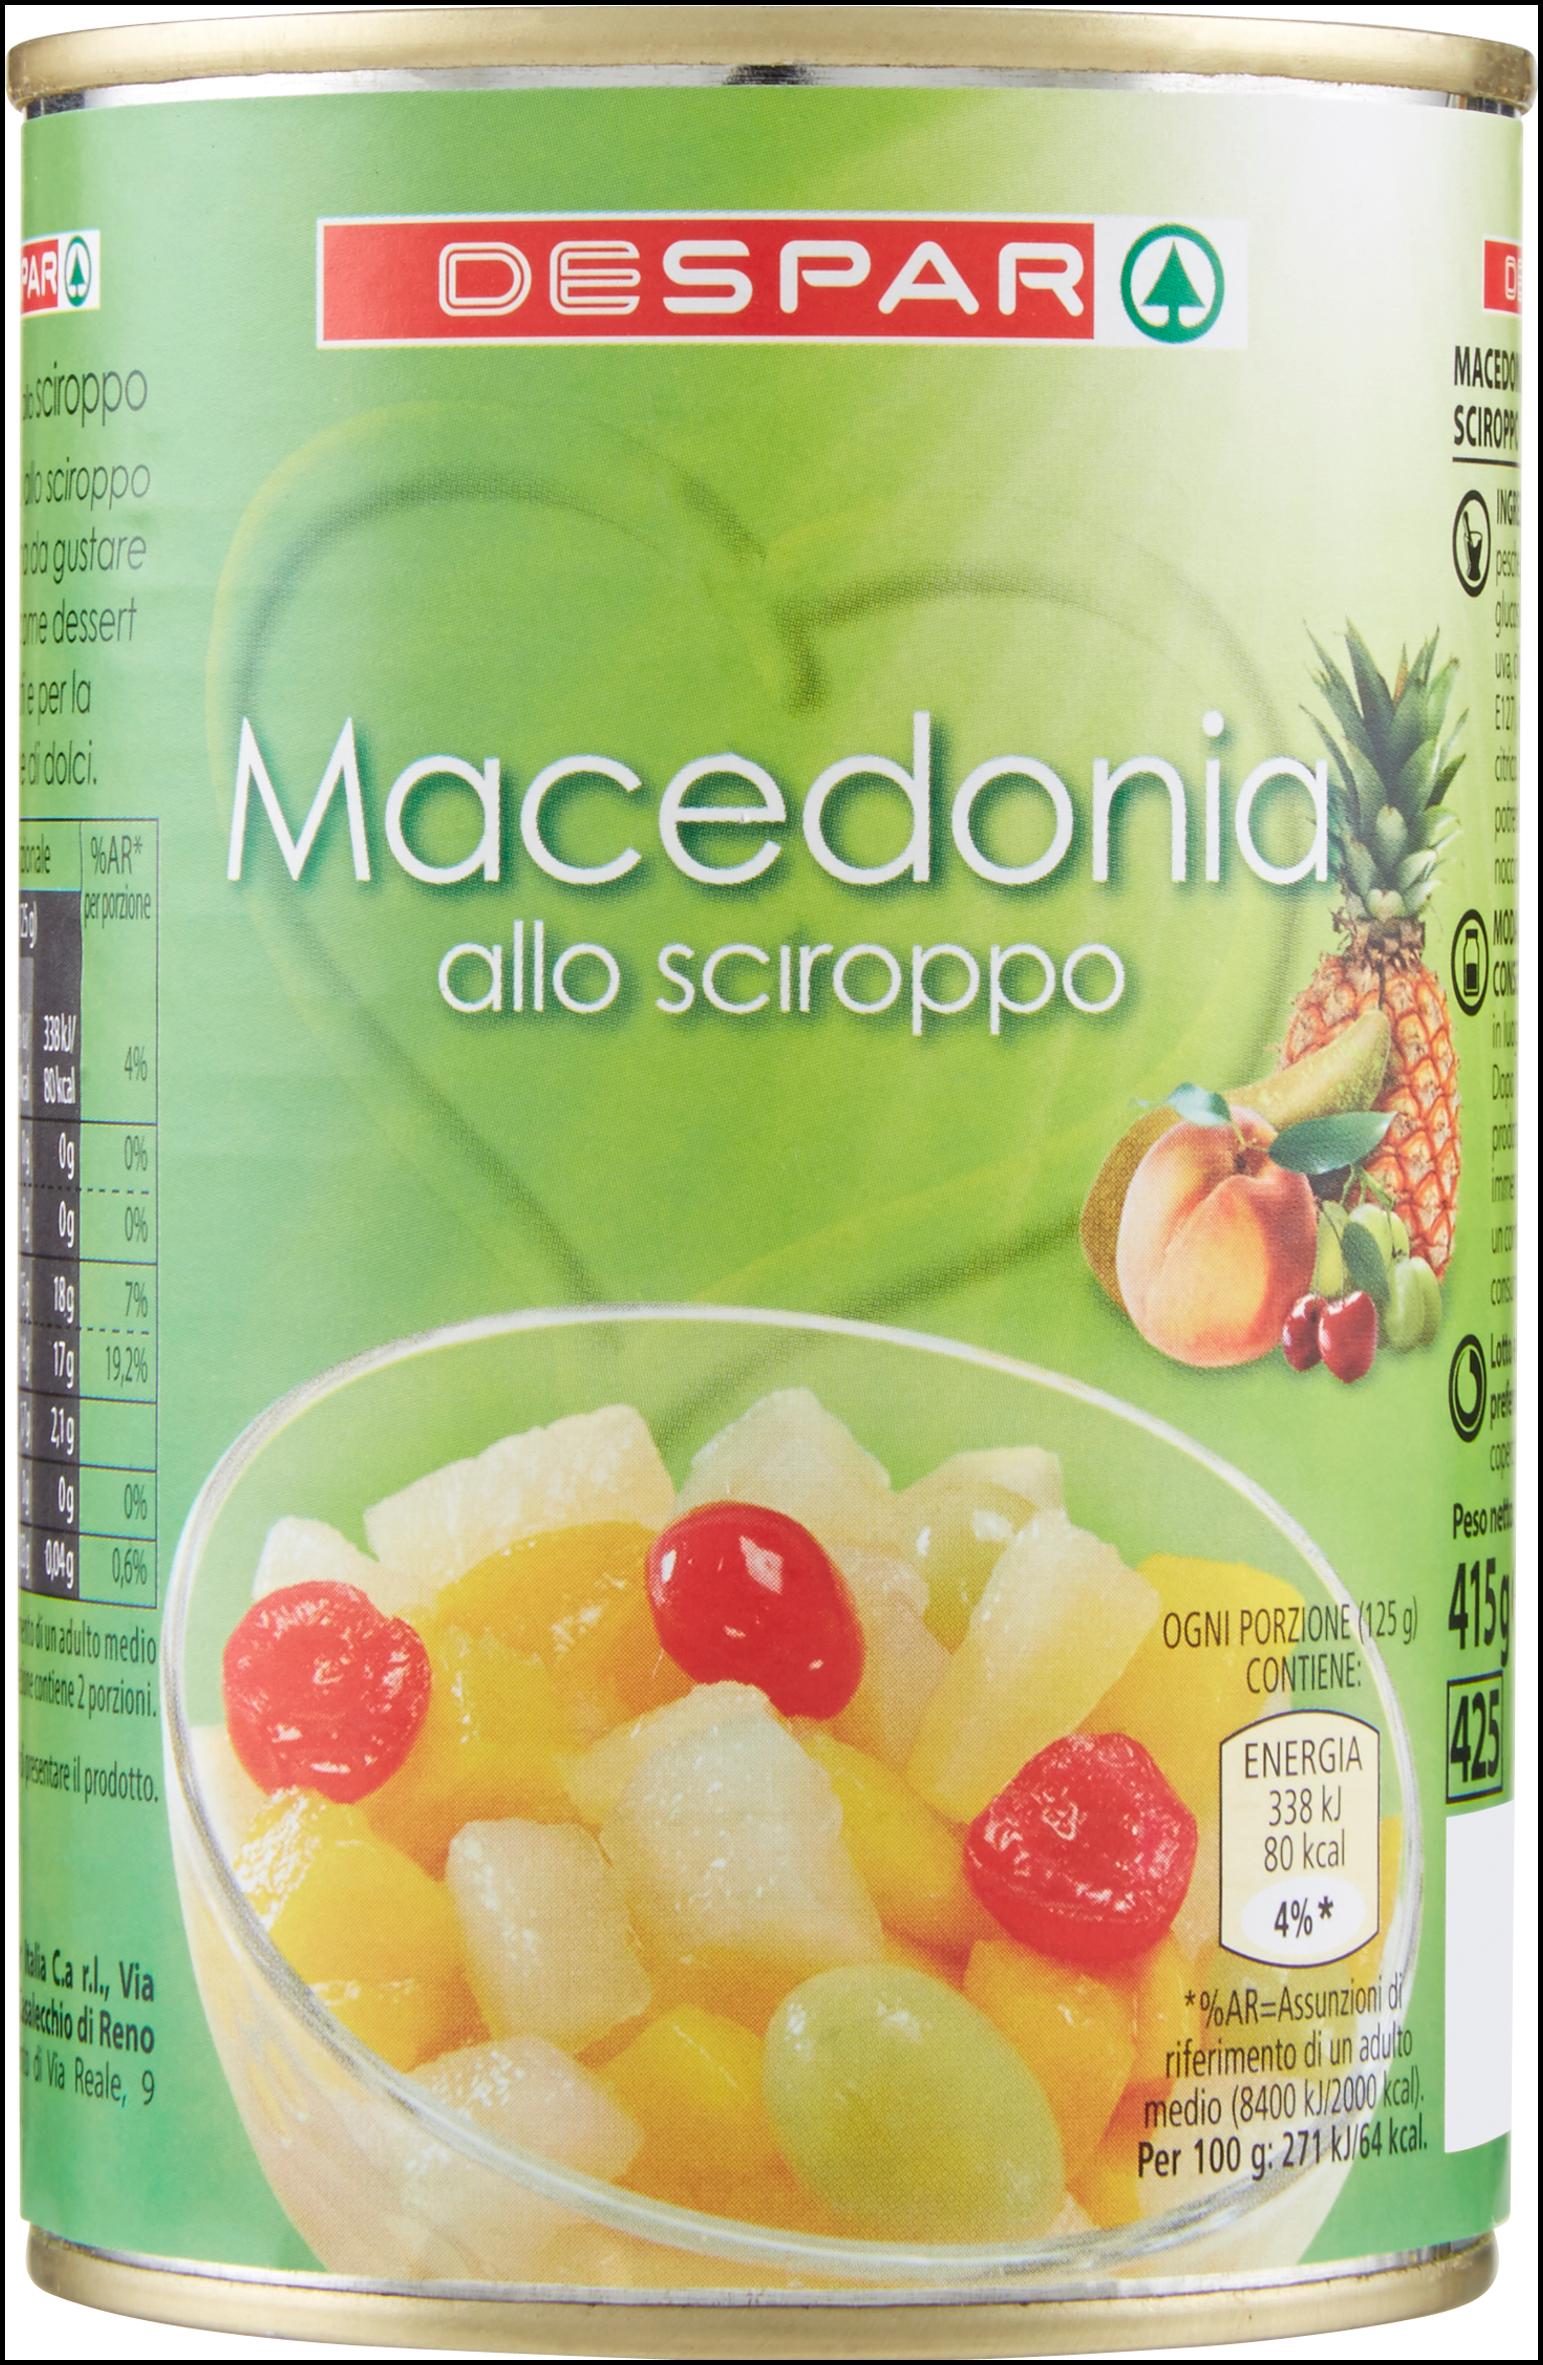 MACEDONIA DESPAR 411G